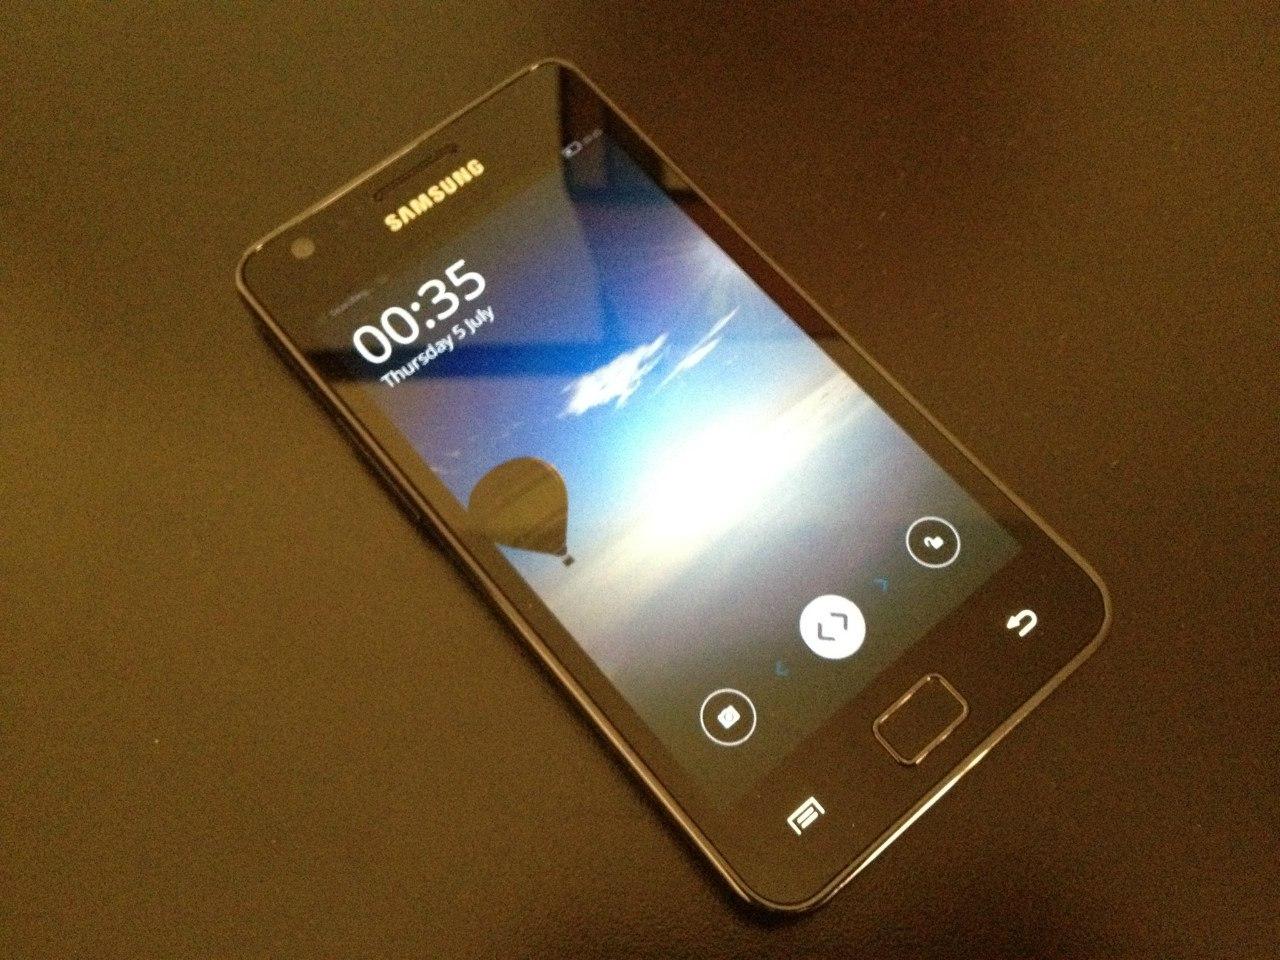 Samsung Galaxy S2 Firefox OS